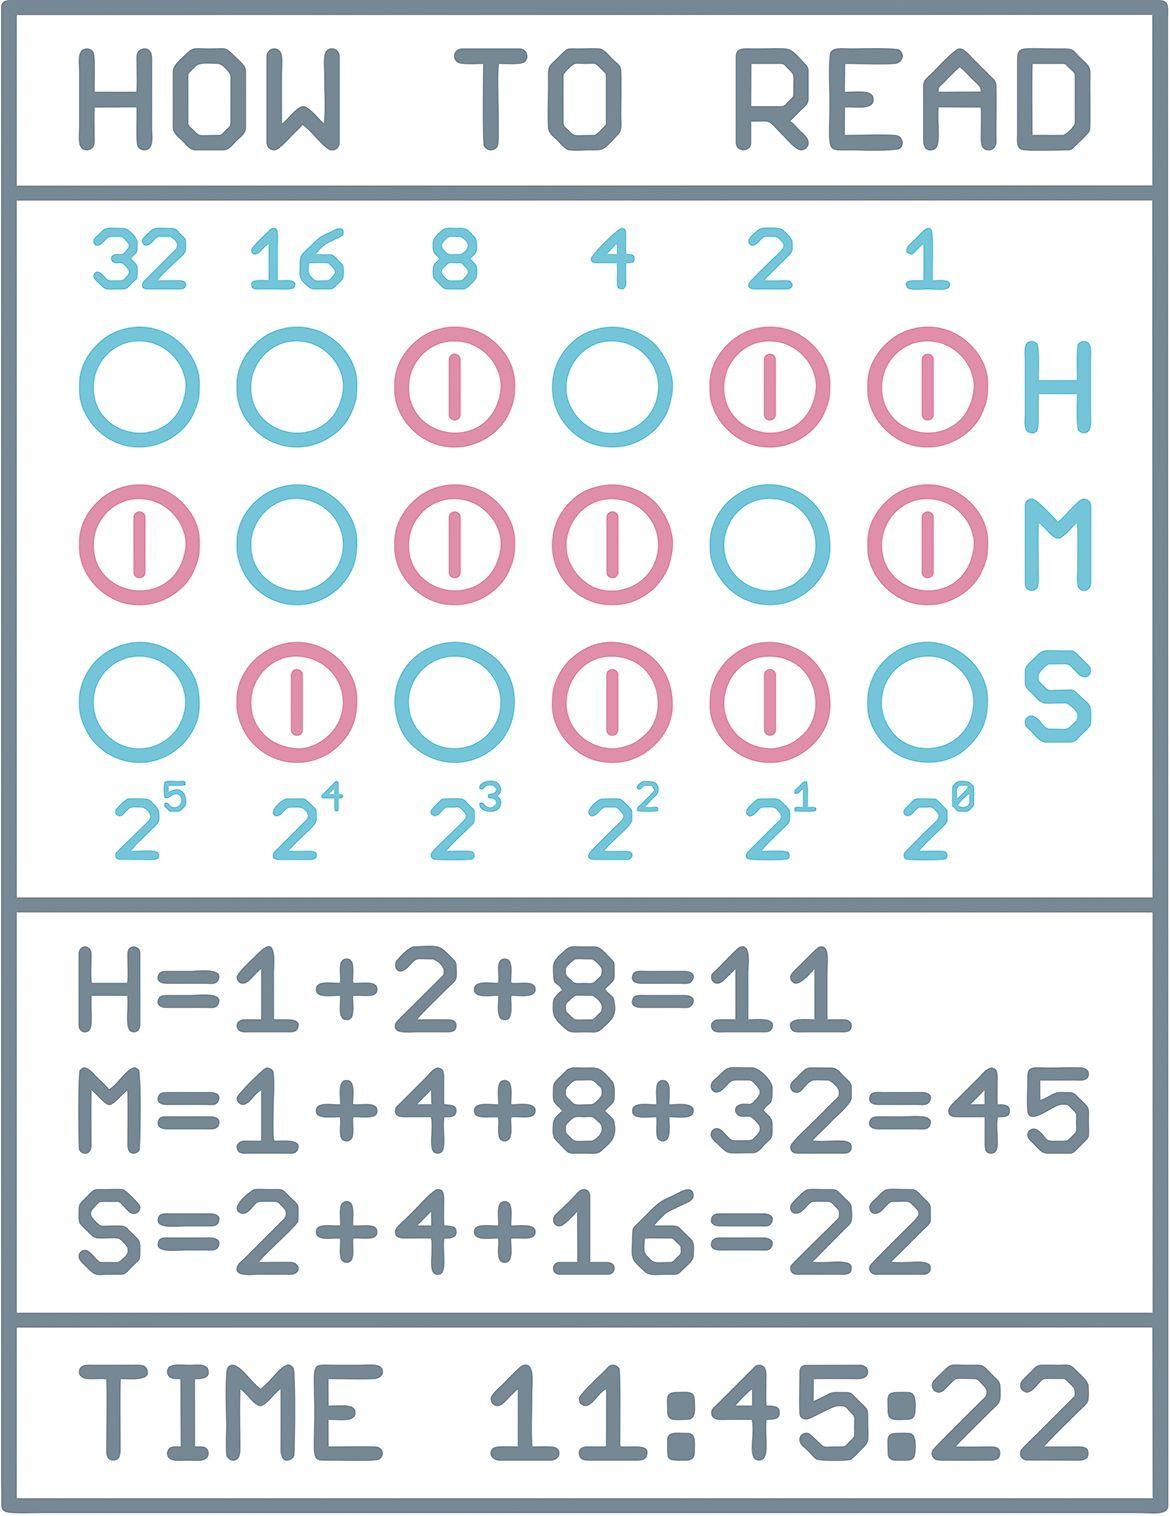 IN-2 Binary Nixie Clock - How to Read Binary Code